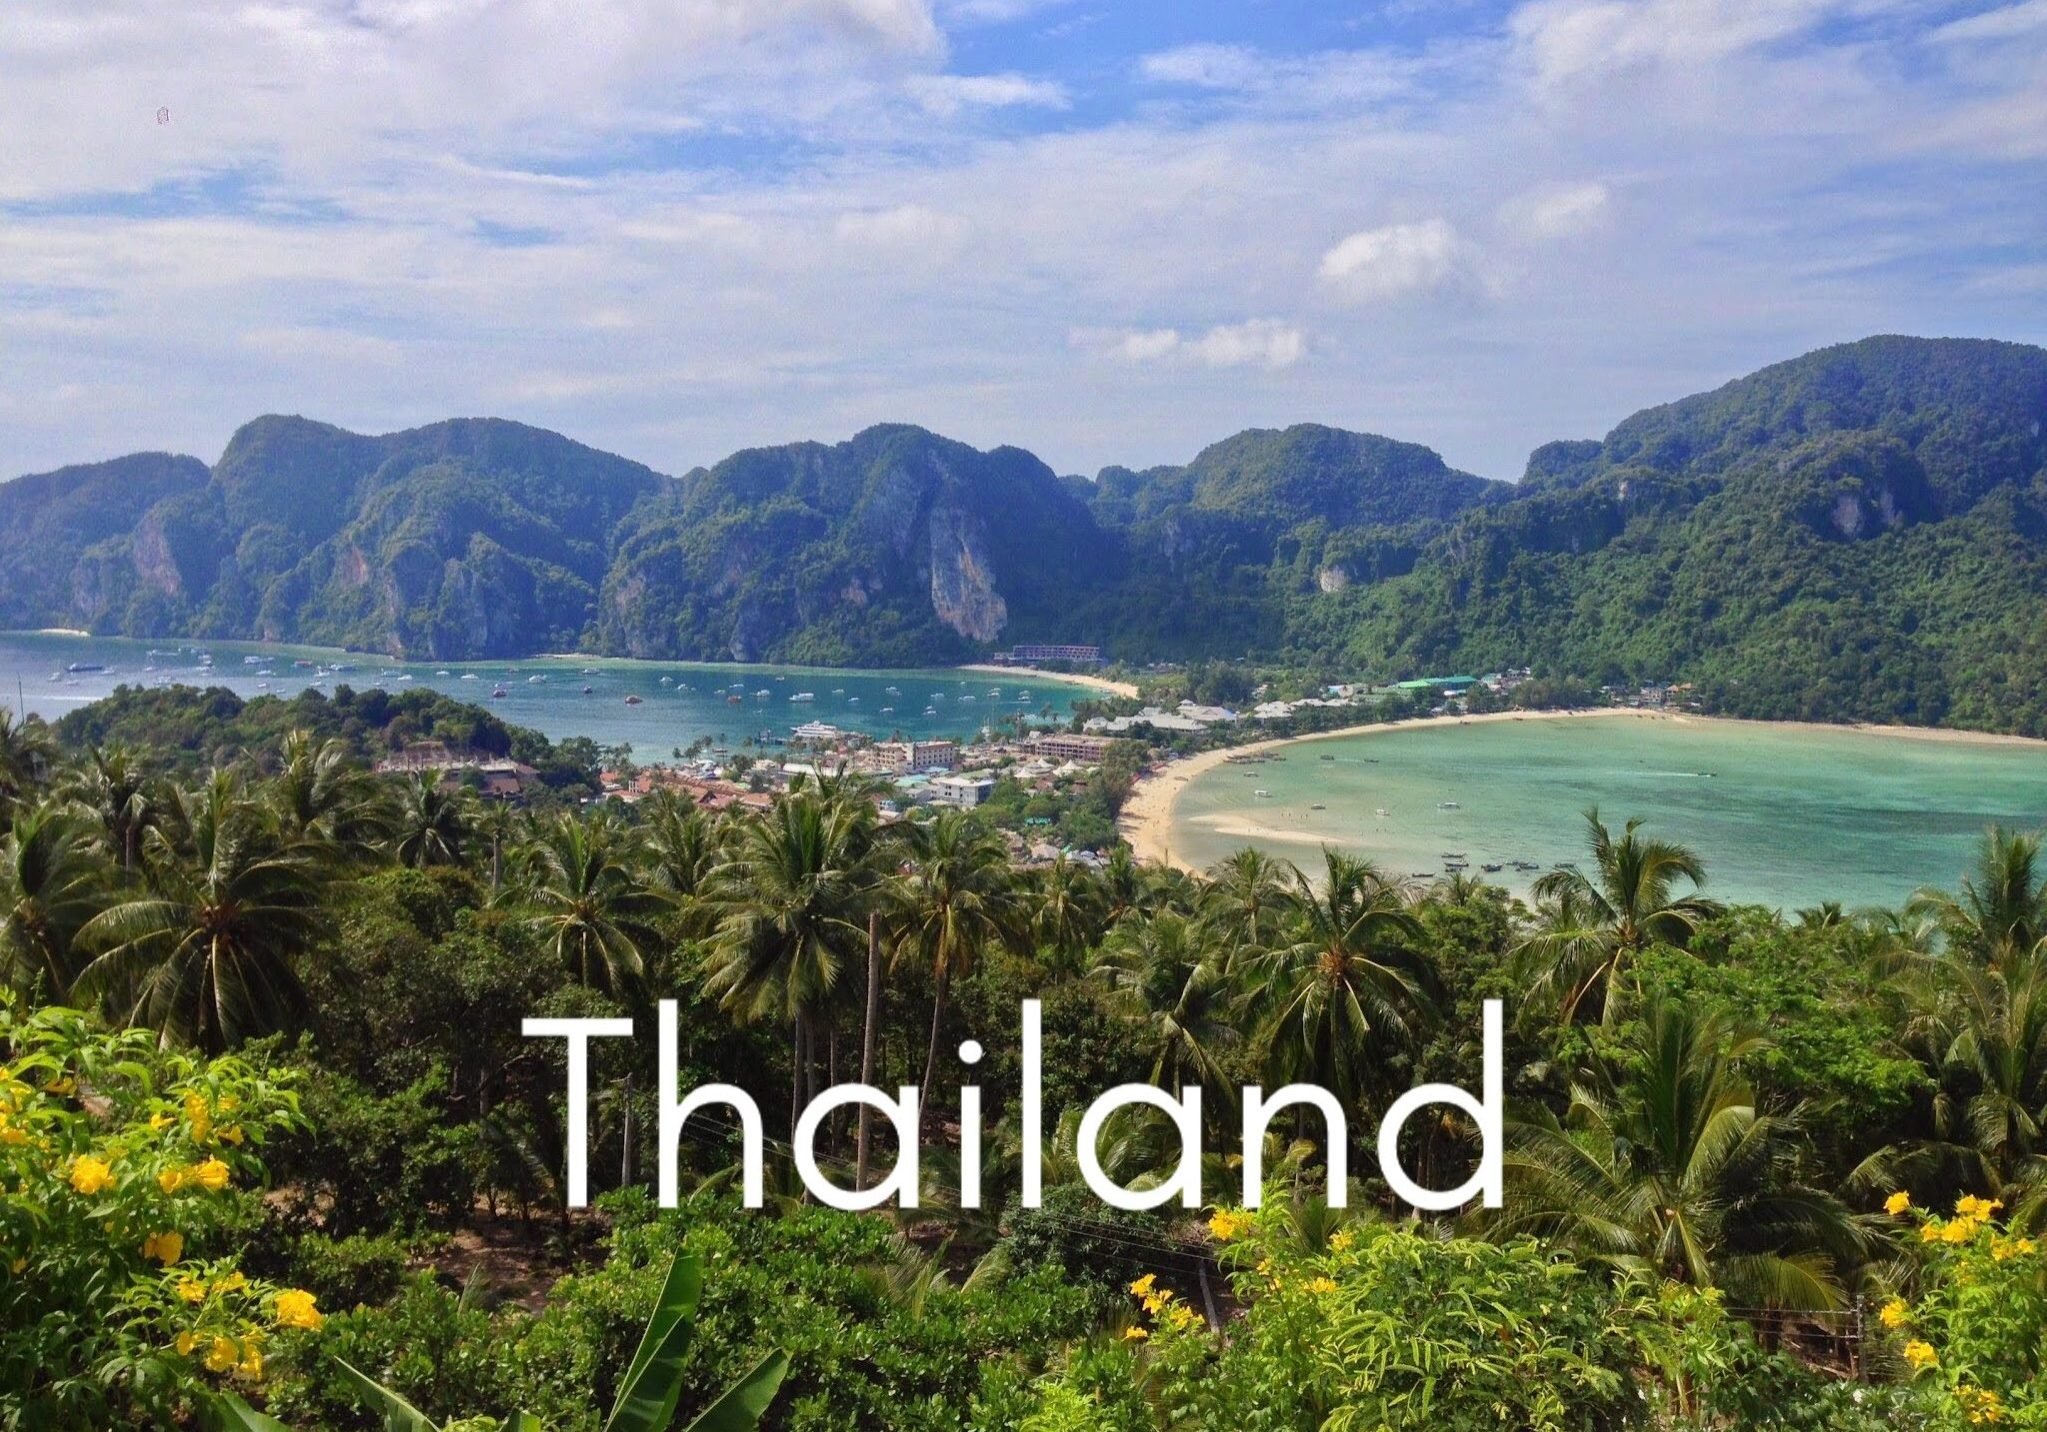 Thailand, wanderdaze, blog, travelling, travel blog,